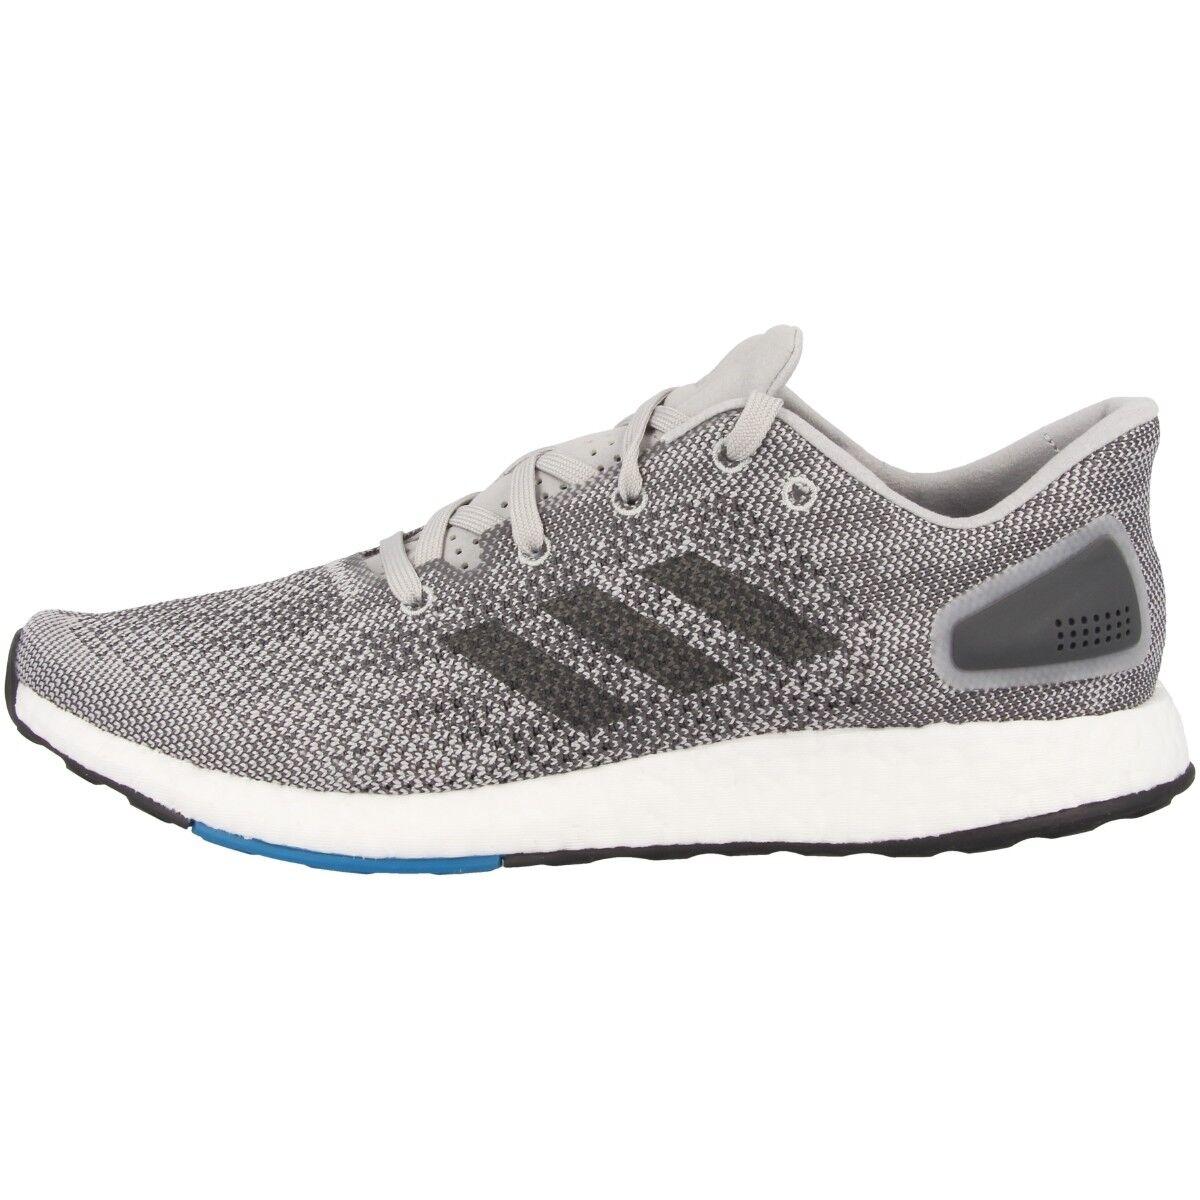 Adidas Herren PureBOOST DPR Men Schuhe Herren Adidas Laufschuhe Sneaker grey S82010 Ultra NMD 27aa37